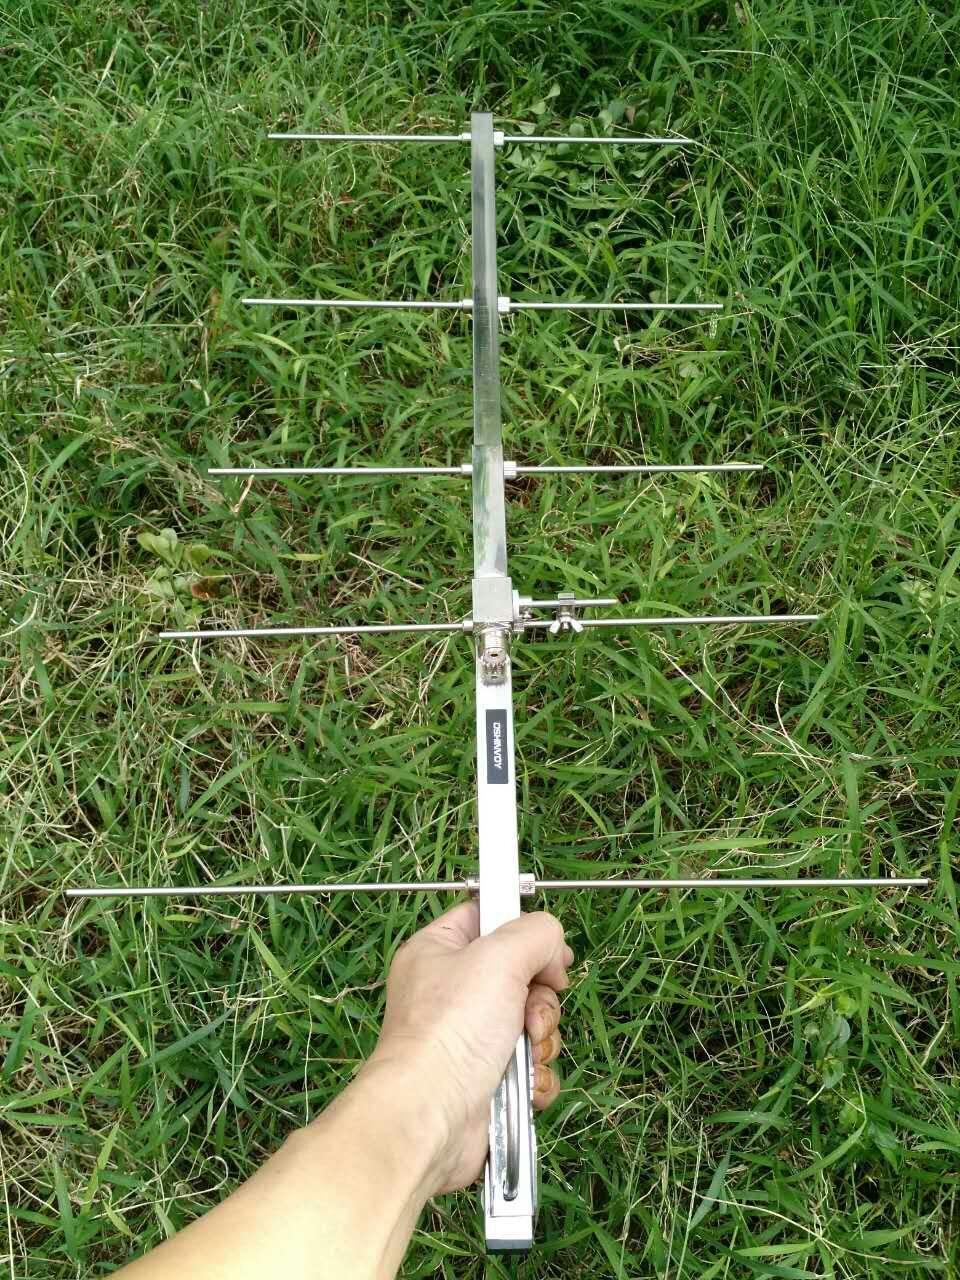 ХАМ 435М иаги антена 5елементс иаги 433МХз 440мхз аматерски УХФ репетитор базна станица иаги антена